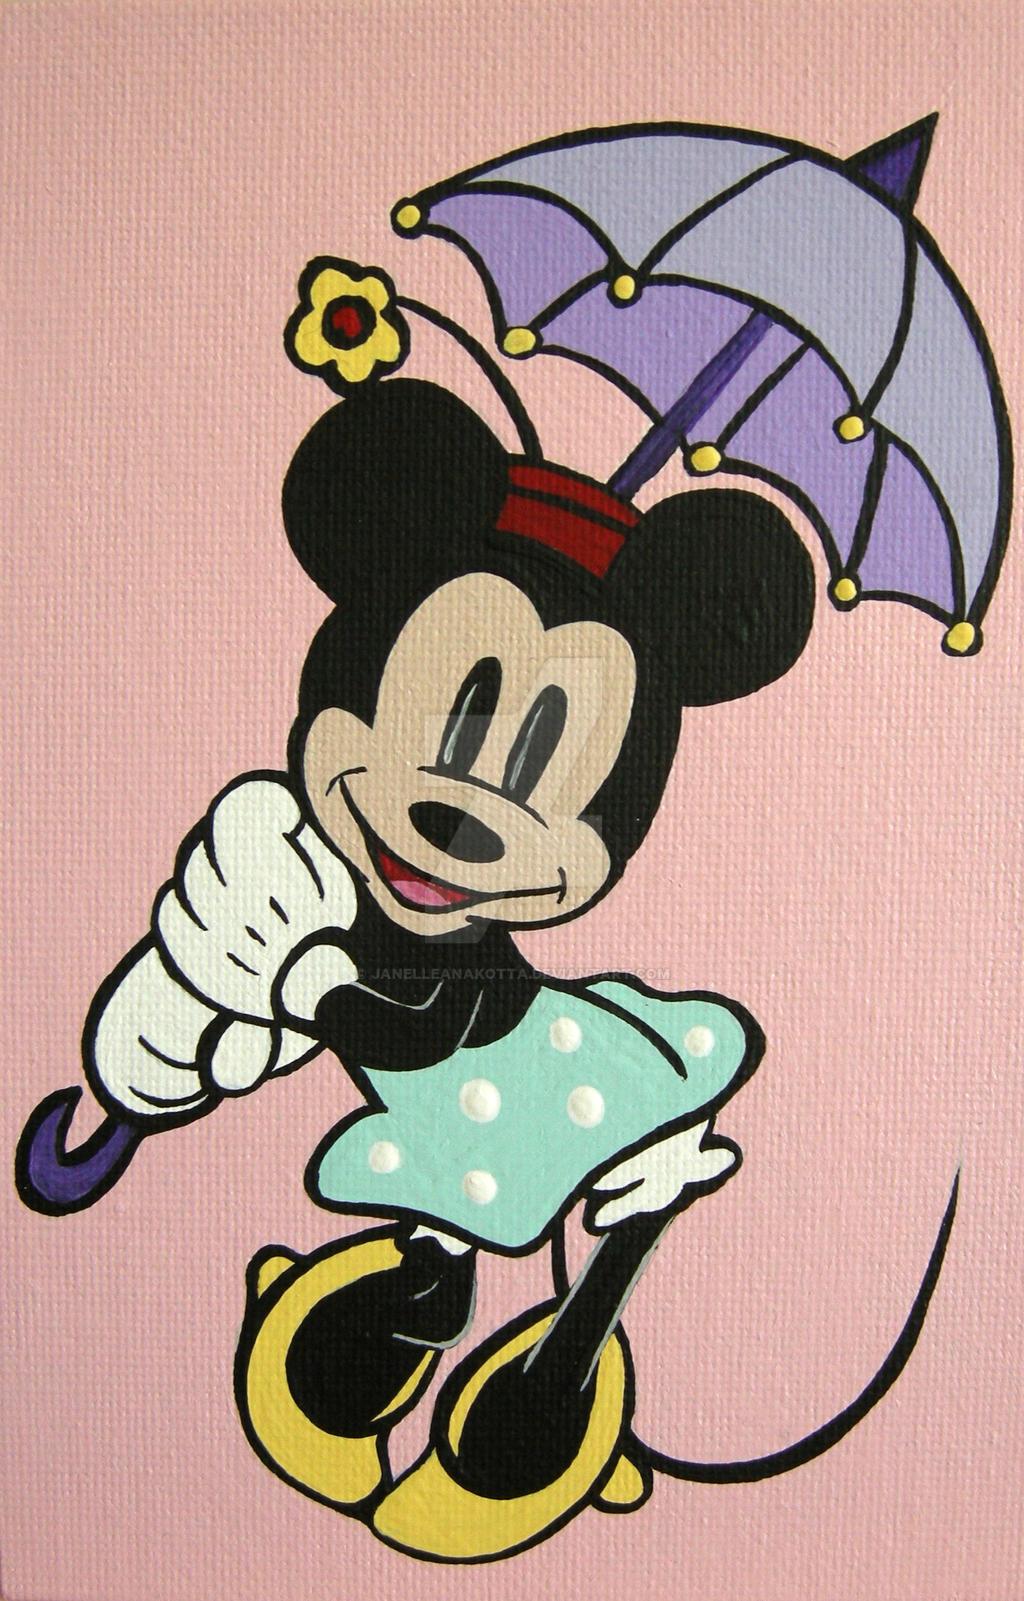 Retro Minnie Mouse | www.pixshark.com - Images Galleries ...